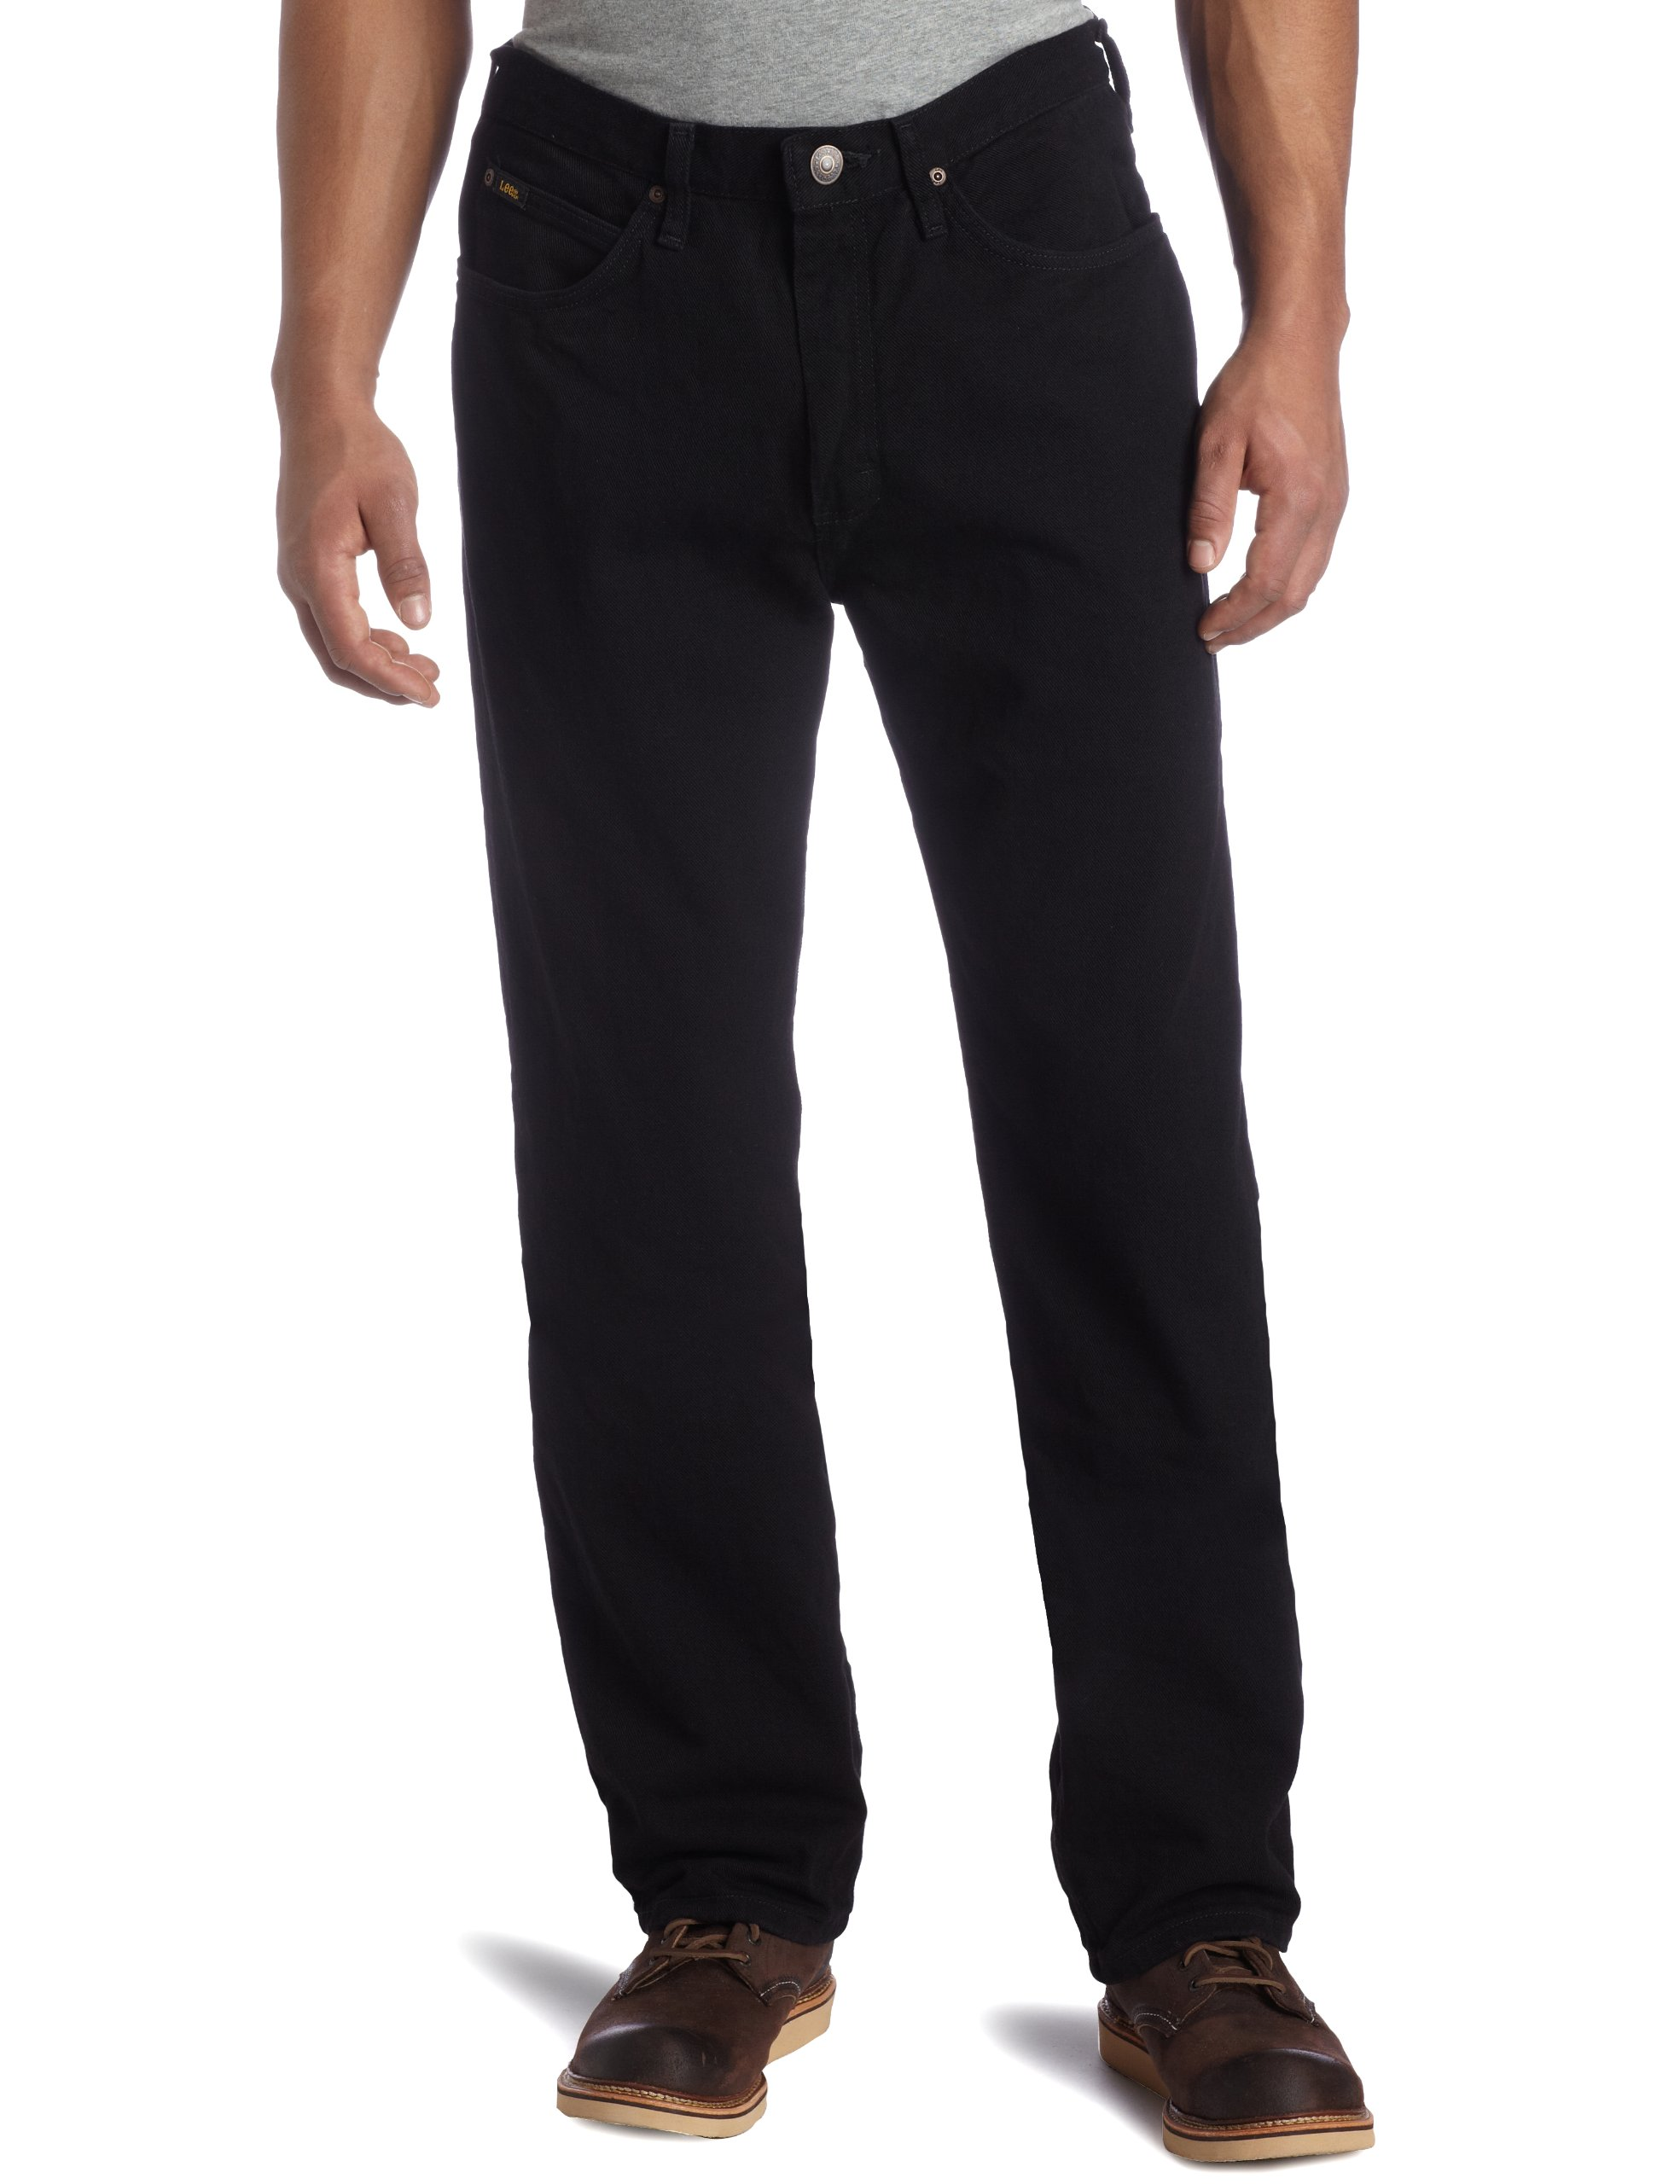 LEE Men's Relaxed Fit Straight Leg Jean, Double Black, 34W x 32L